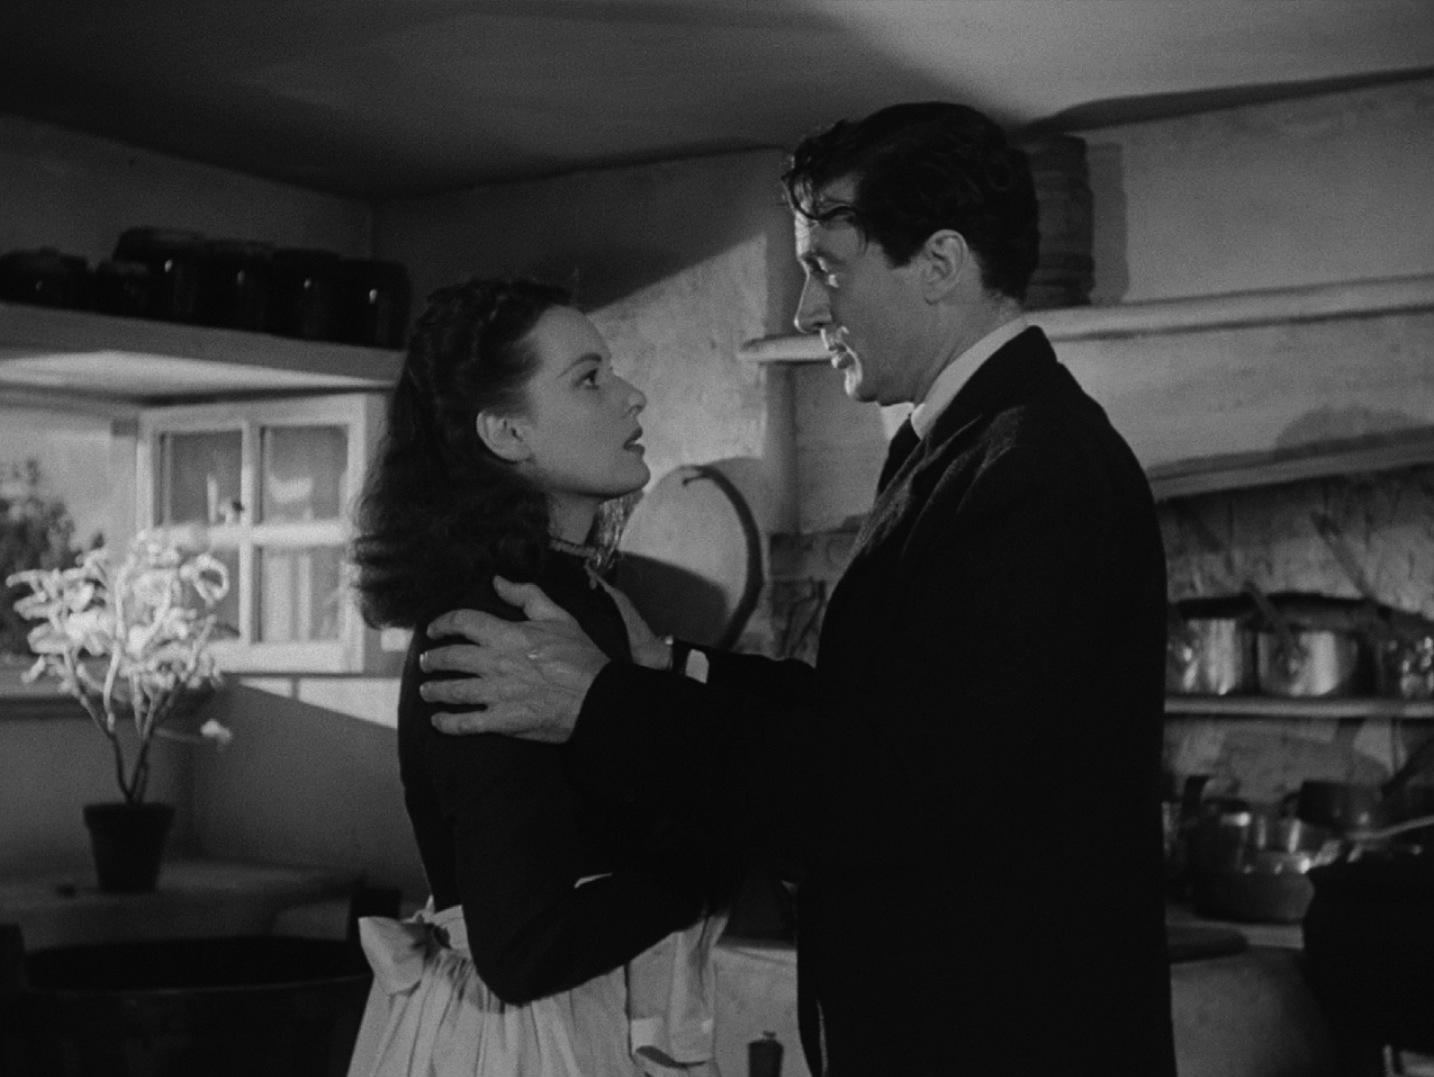 Фильм «Как зелена была моя долина» (1941): Морин О'Хара, Уолтер Пиджон 1434x1077